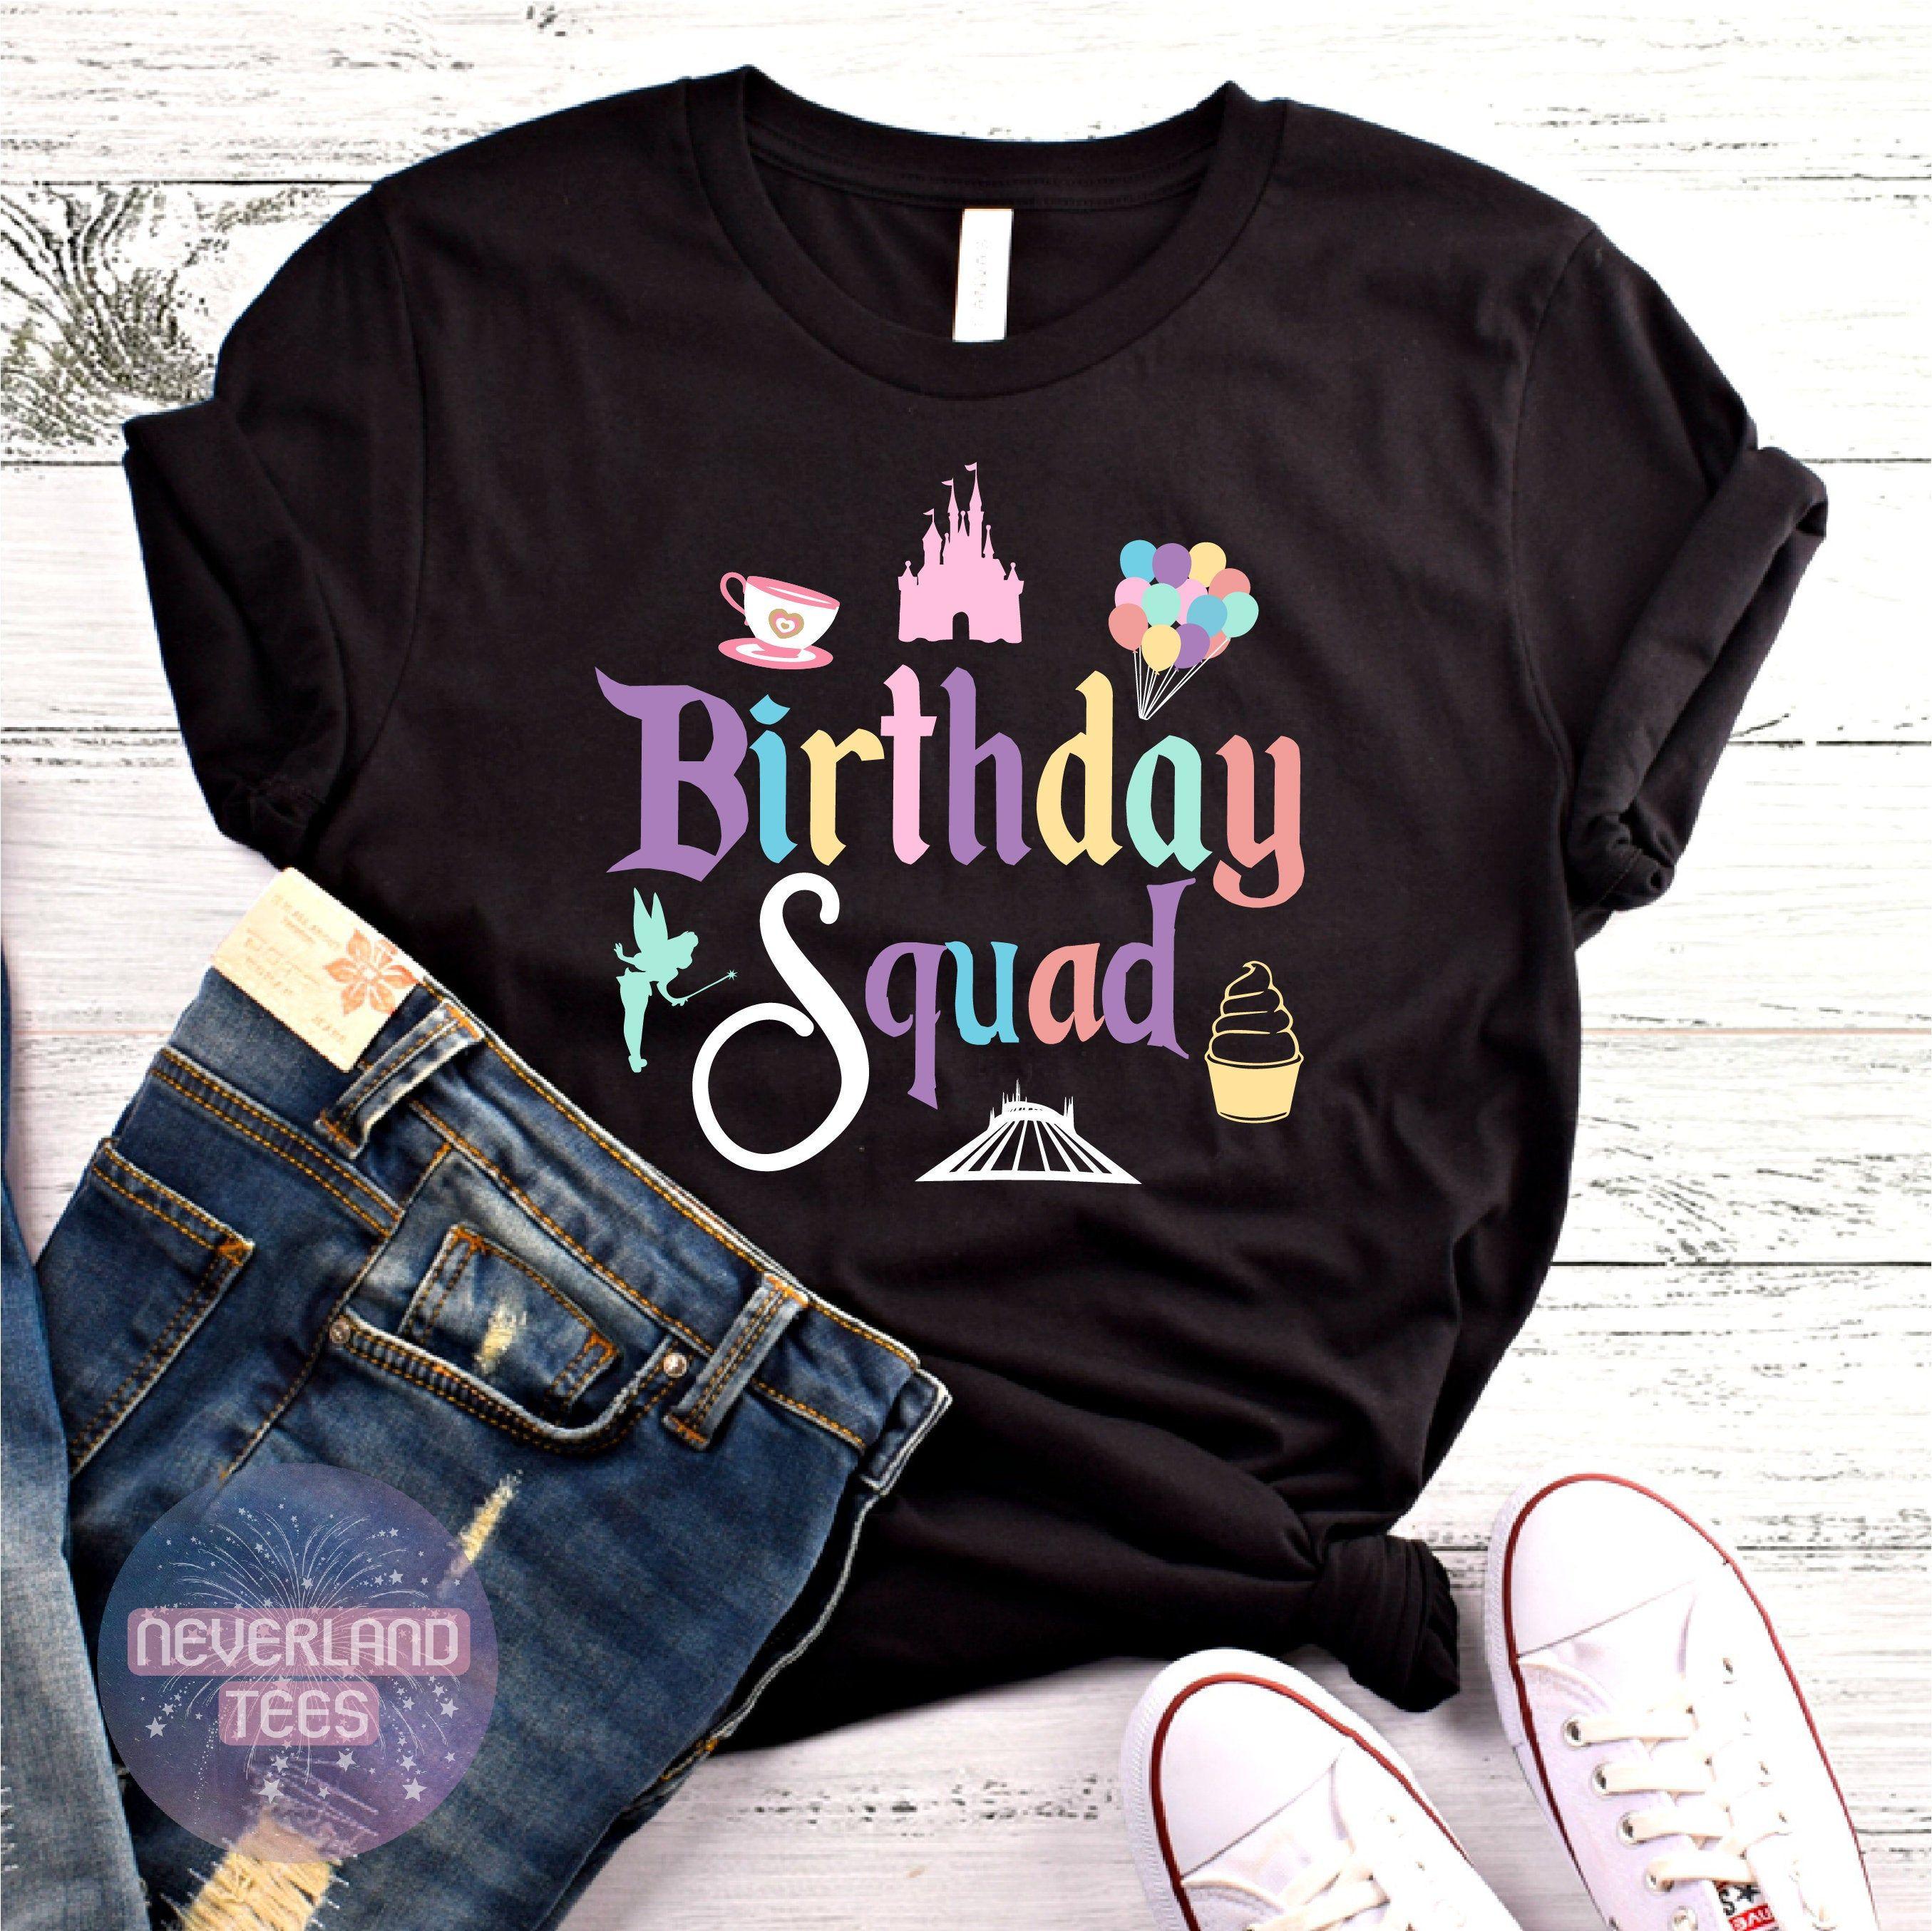 Birthday squad unisex shirt disney birthday shirt disney